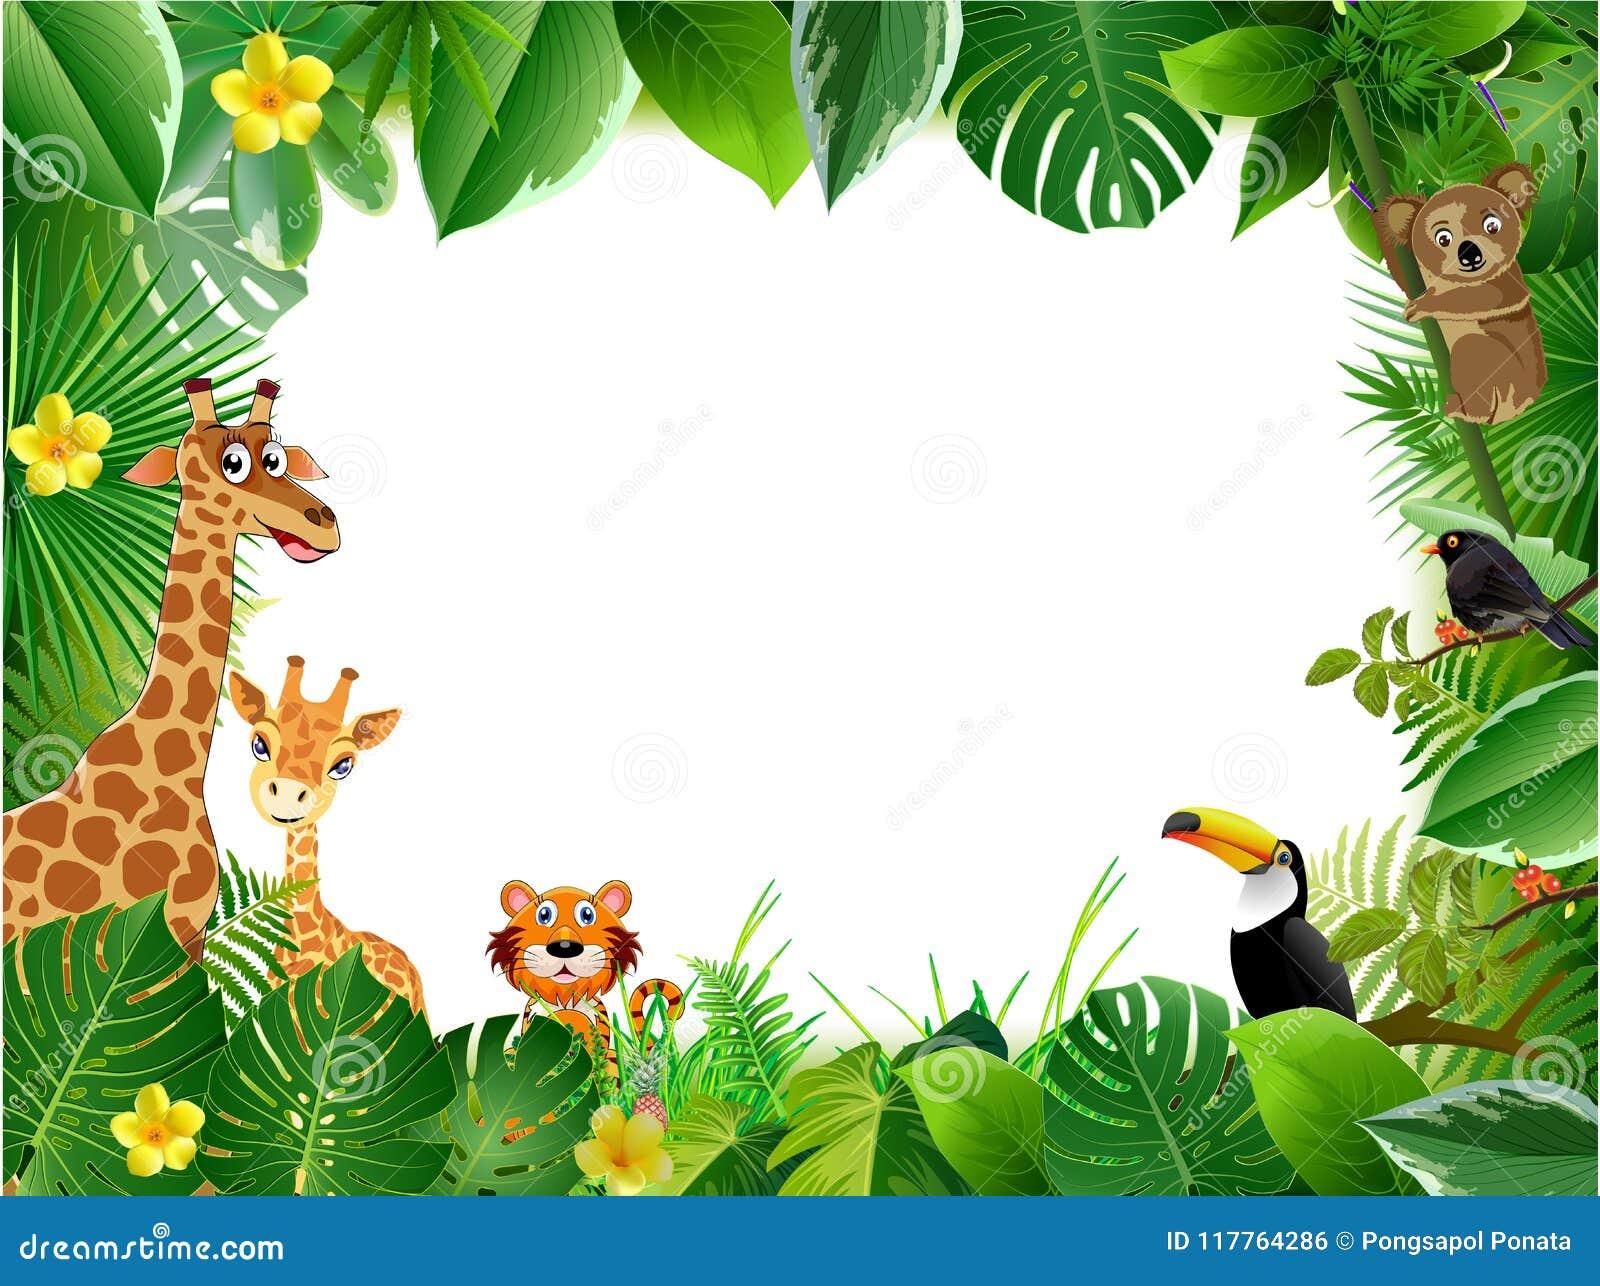 Fondos De Animales Animados: Bright Tropical Background With Cartoon; Jungle; Animals